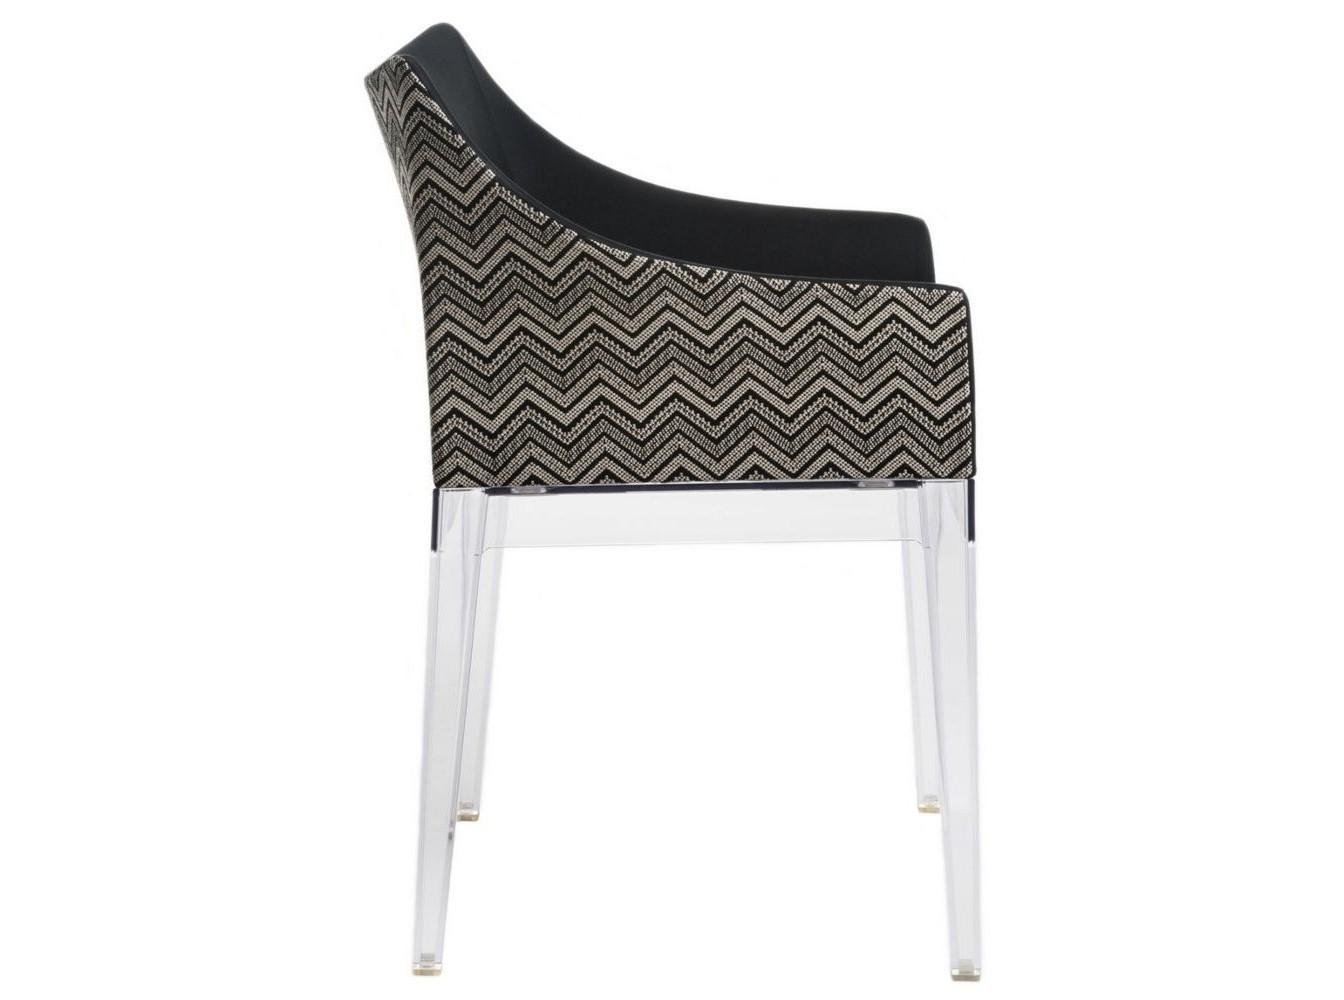 Стул с подлокотникамиОбеденные стулья<br><br><br>kit: None<br>gender: None